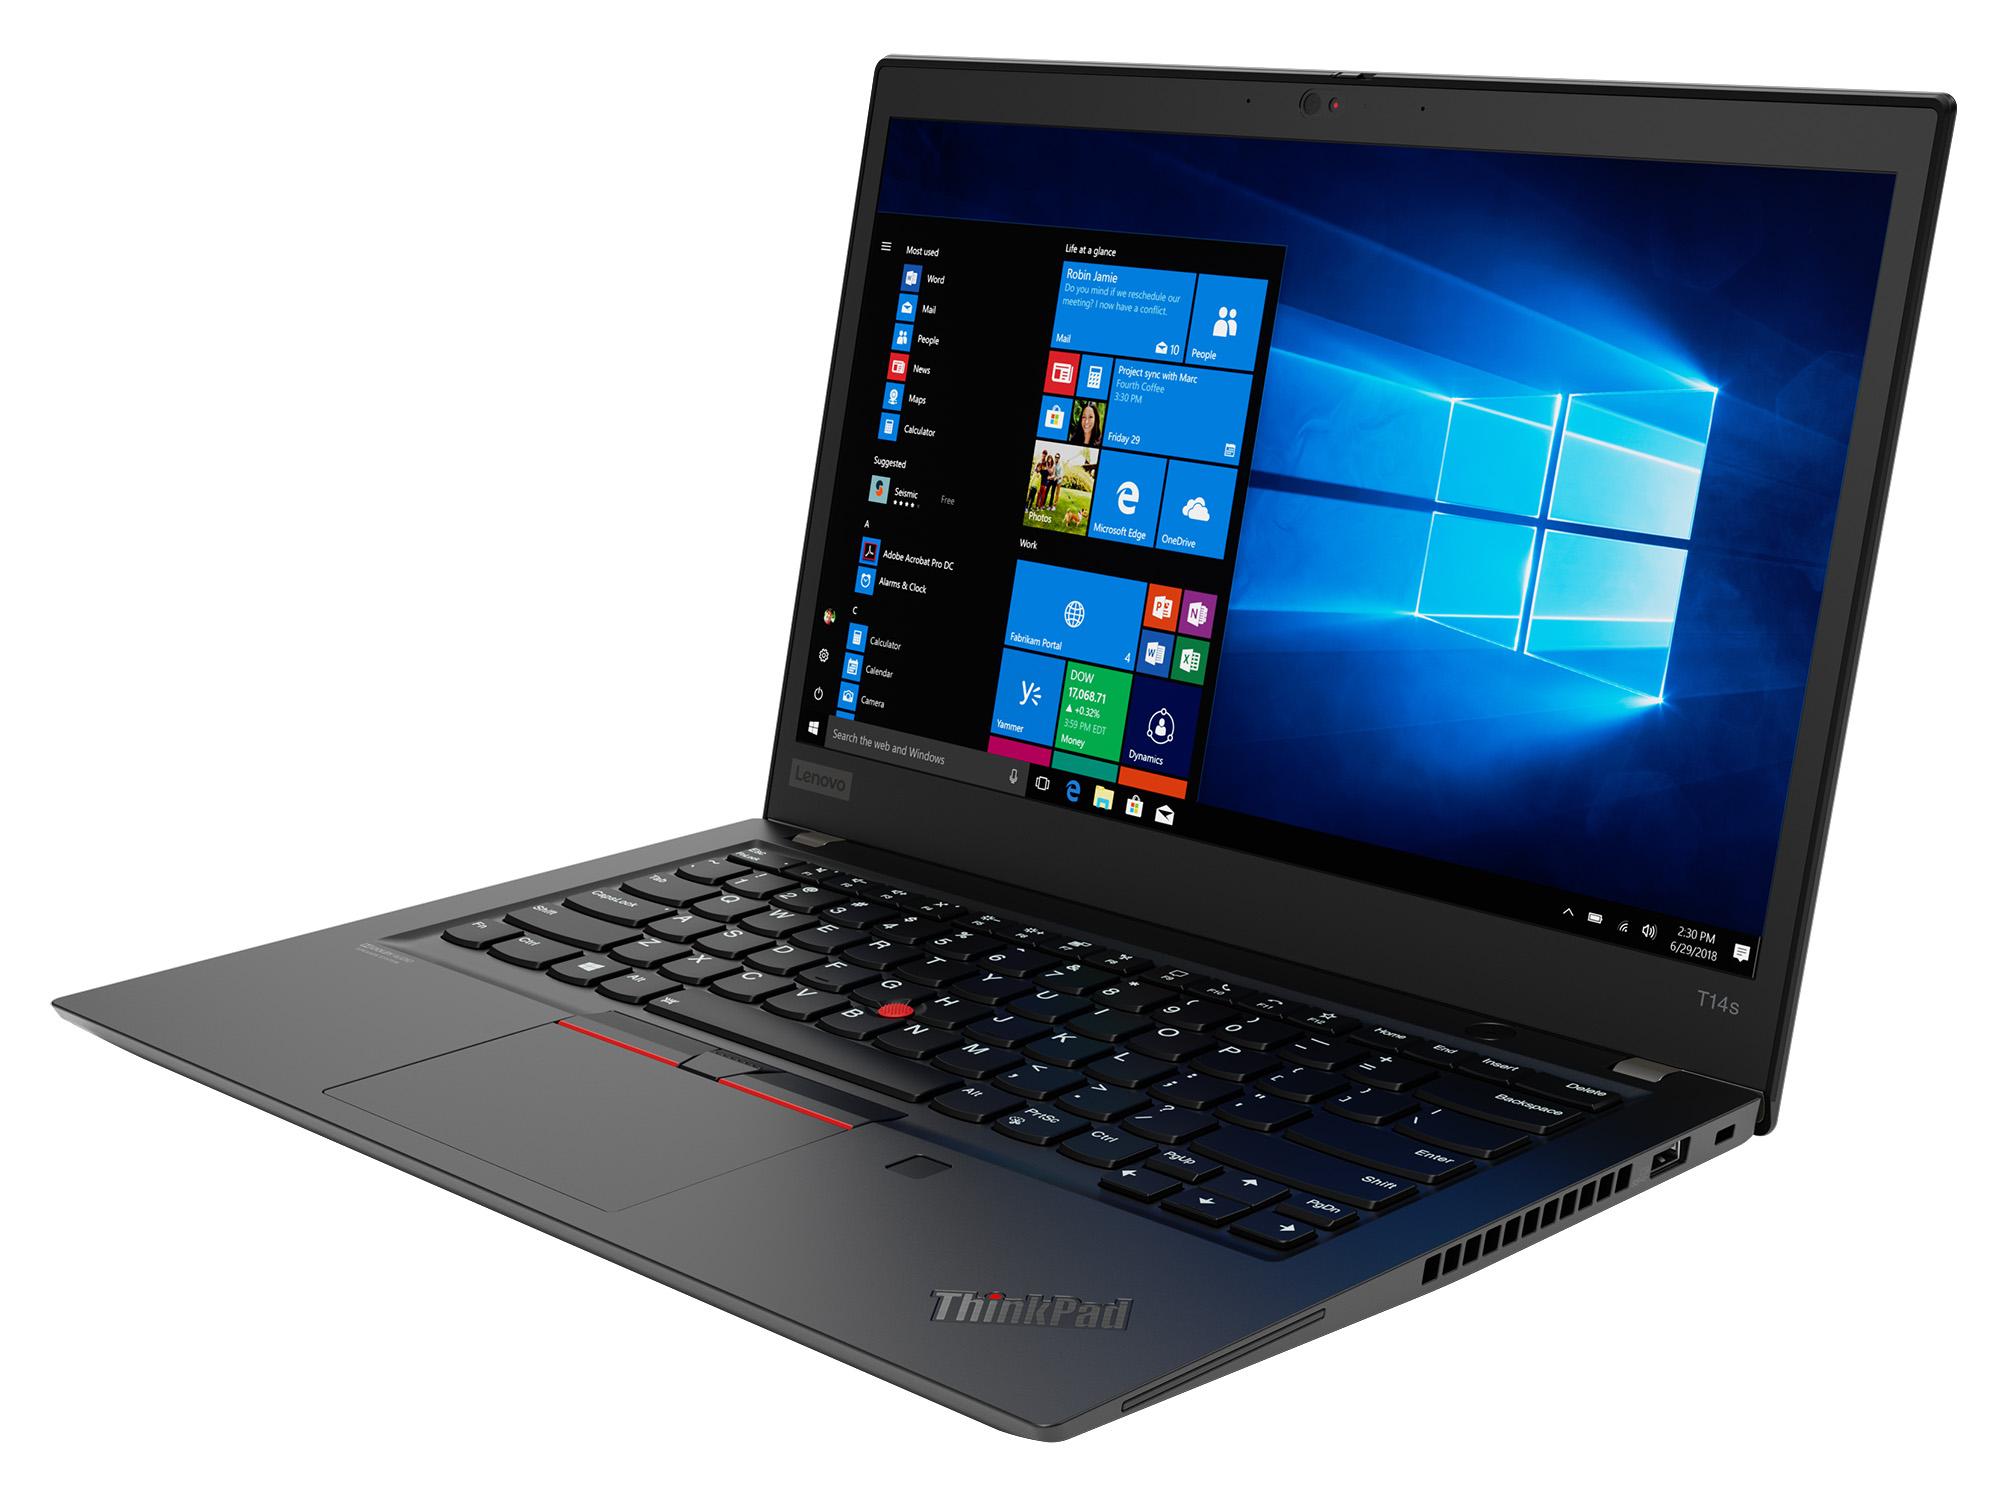 Фото  Ноутбук ThinkPad T14s 1st Gen (20T00015RT)